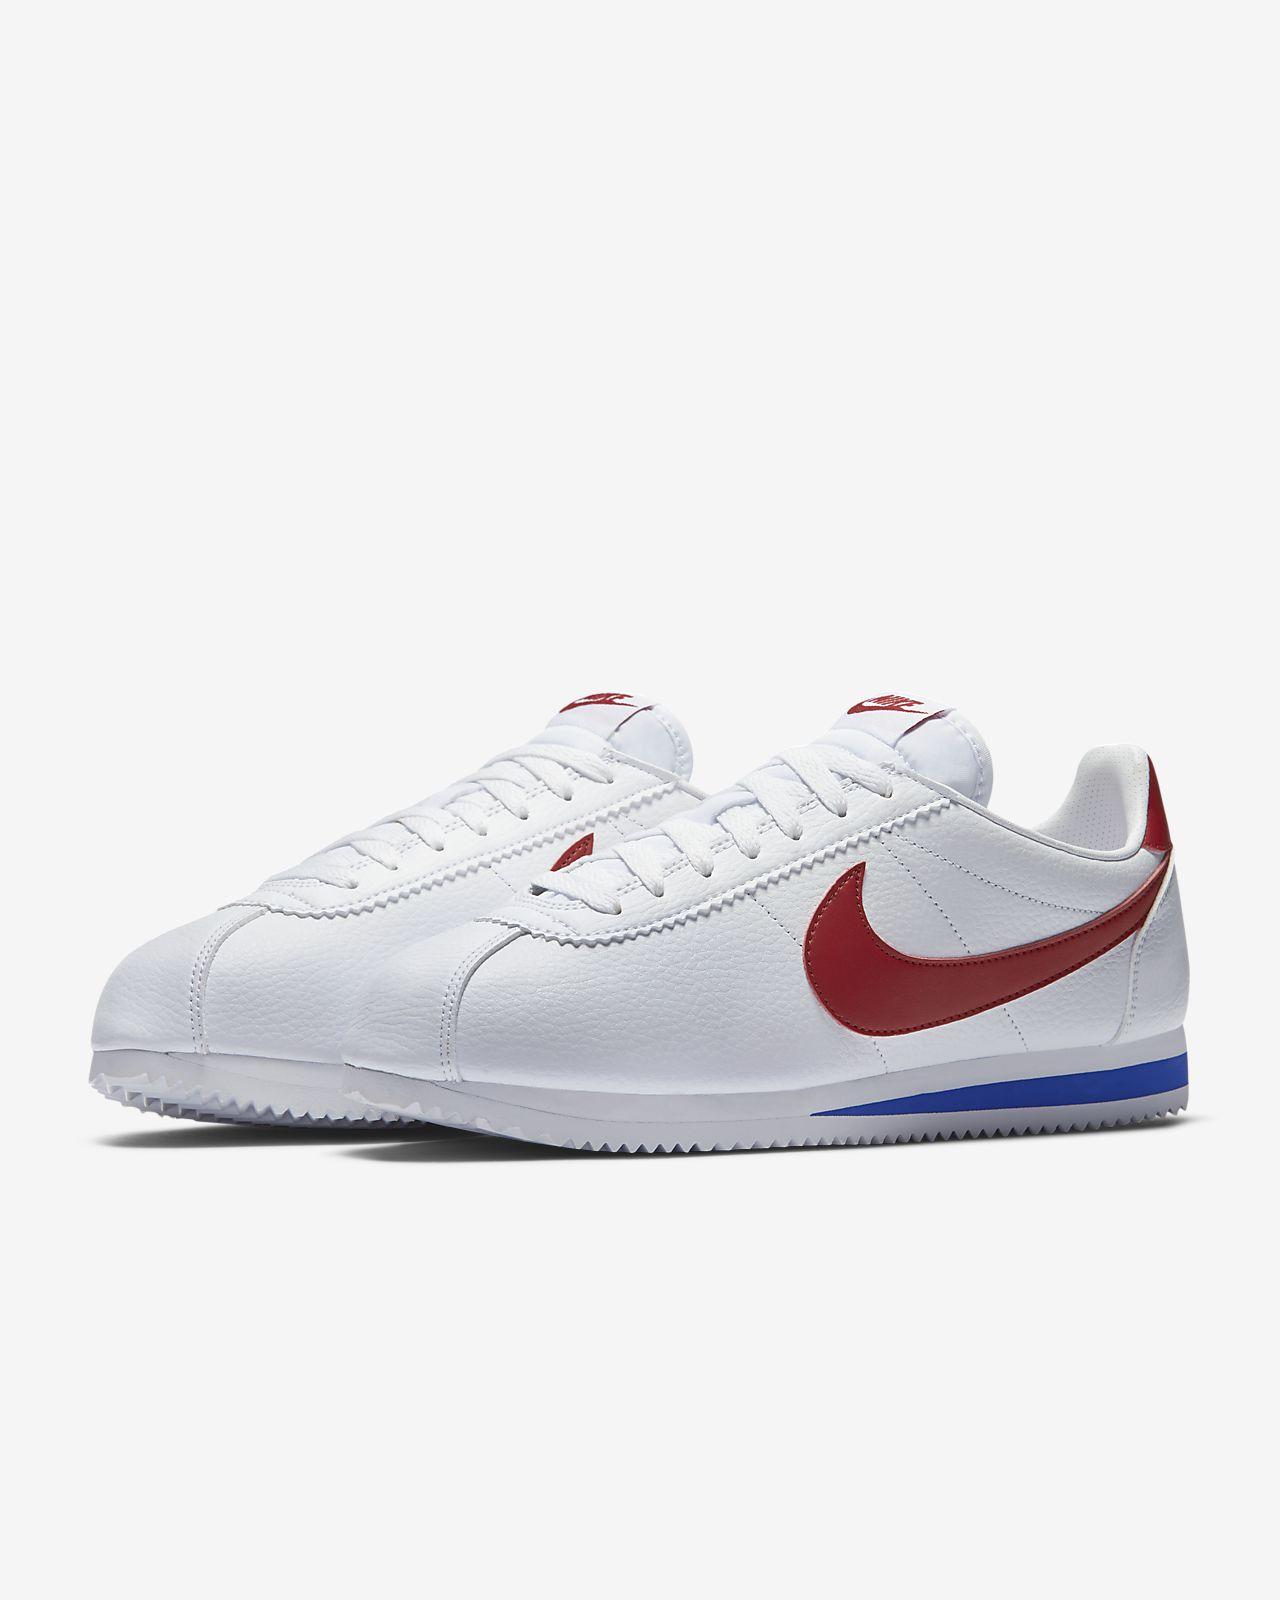 detailed look 82a89 58a69 ... Nike Classic Cortez Zapatillas - Hombre